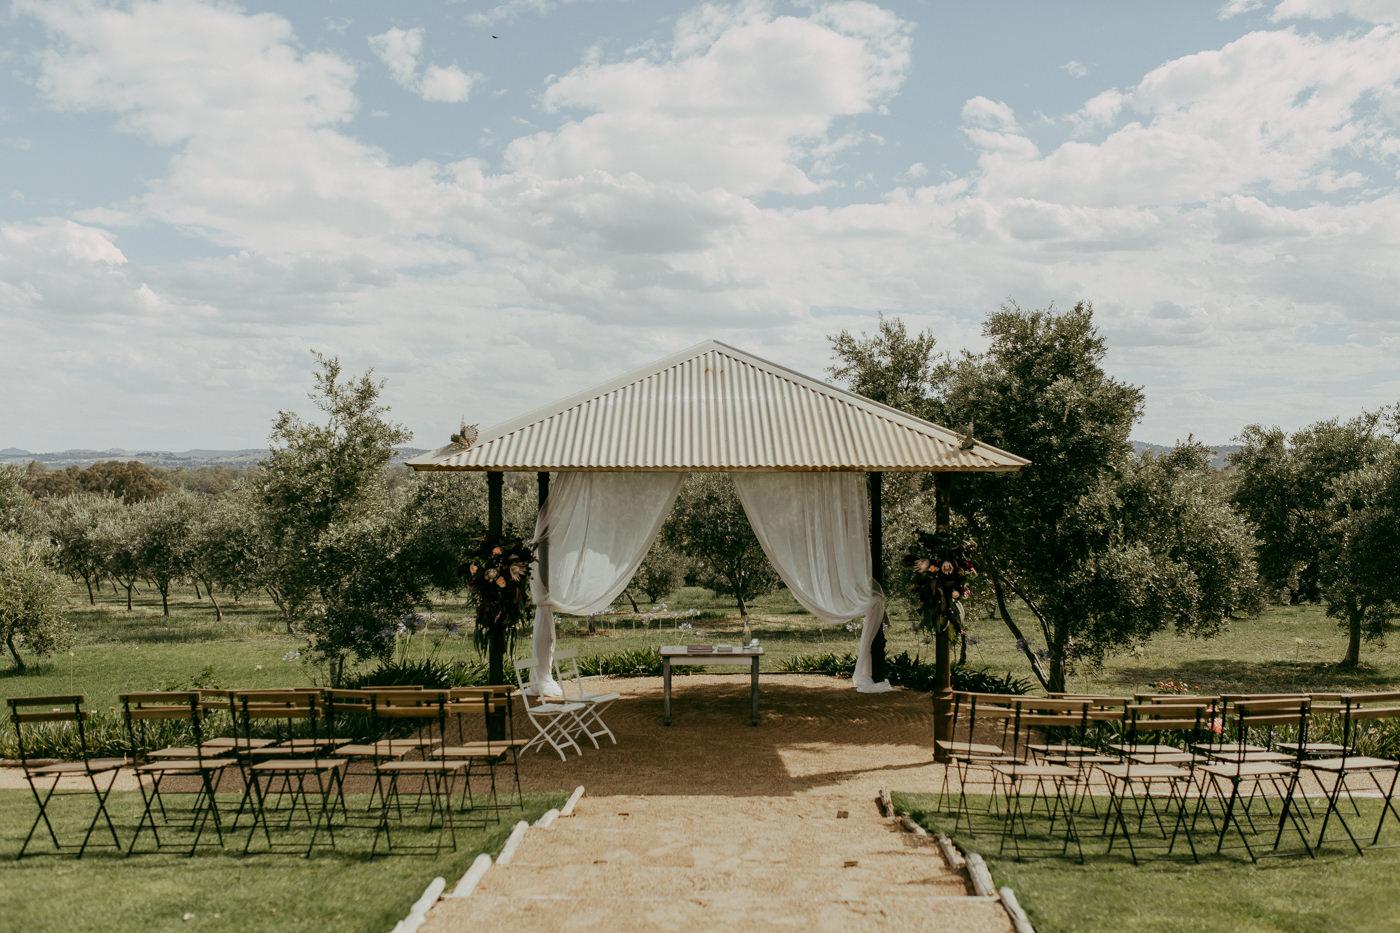 Anthony & Eliet - Wagga Wagga Wedding - Country NSW - Samantha Heather Photography-89.jpg